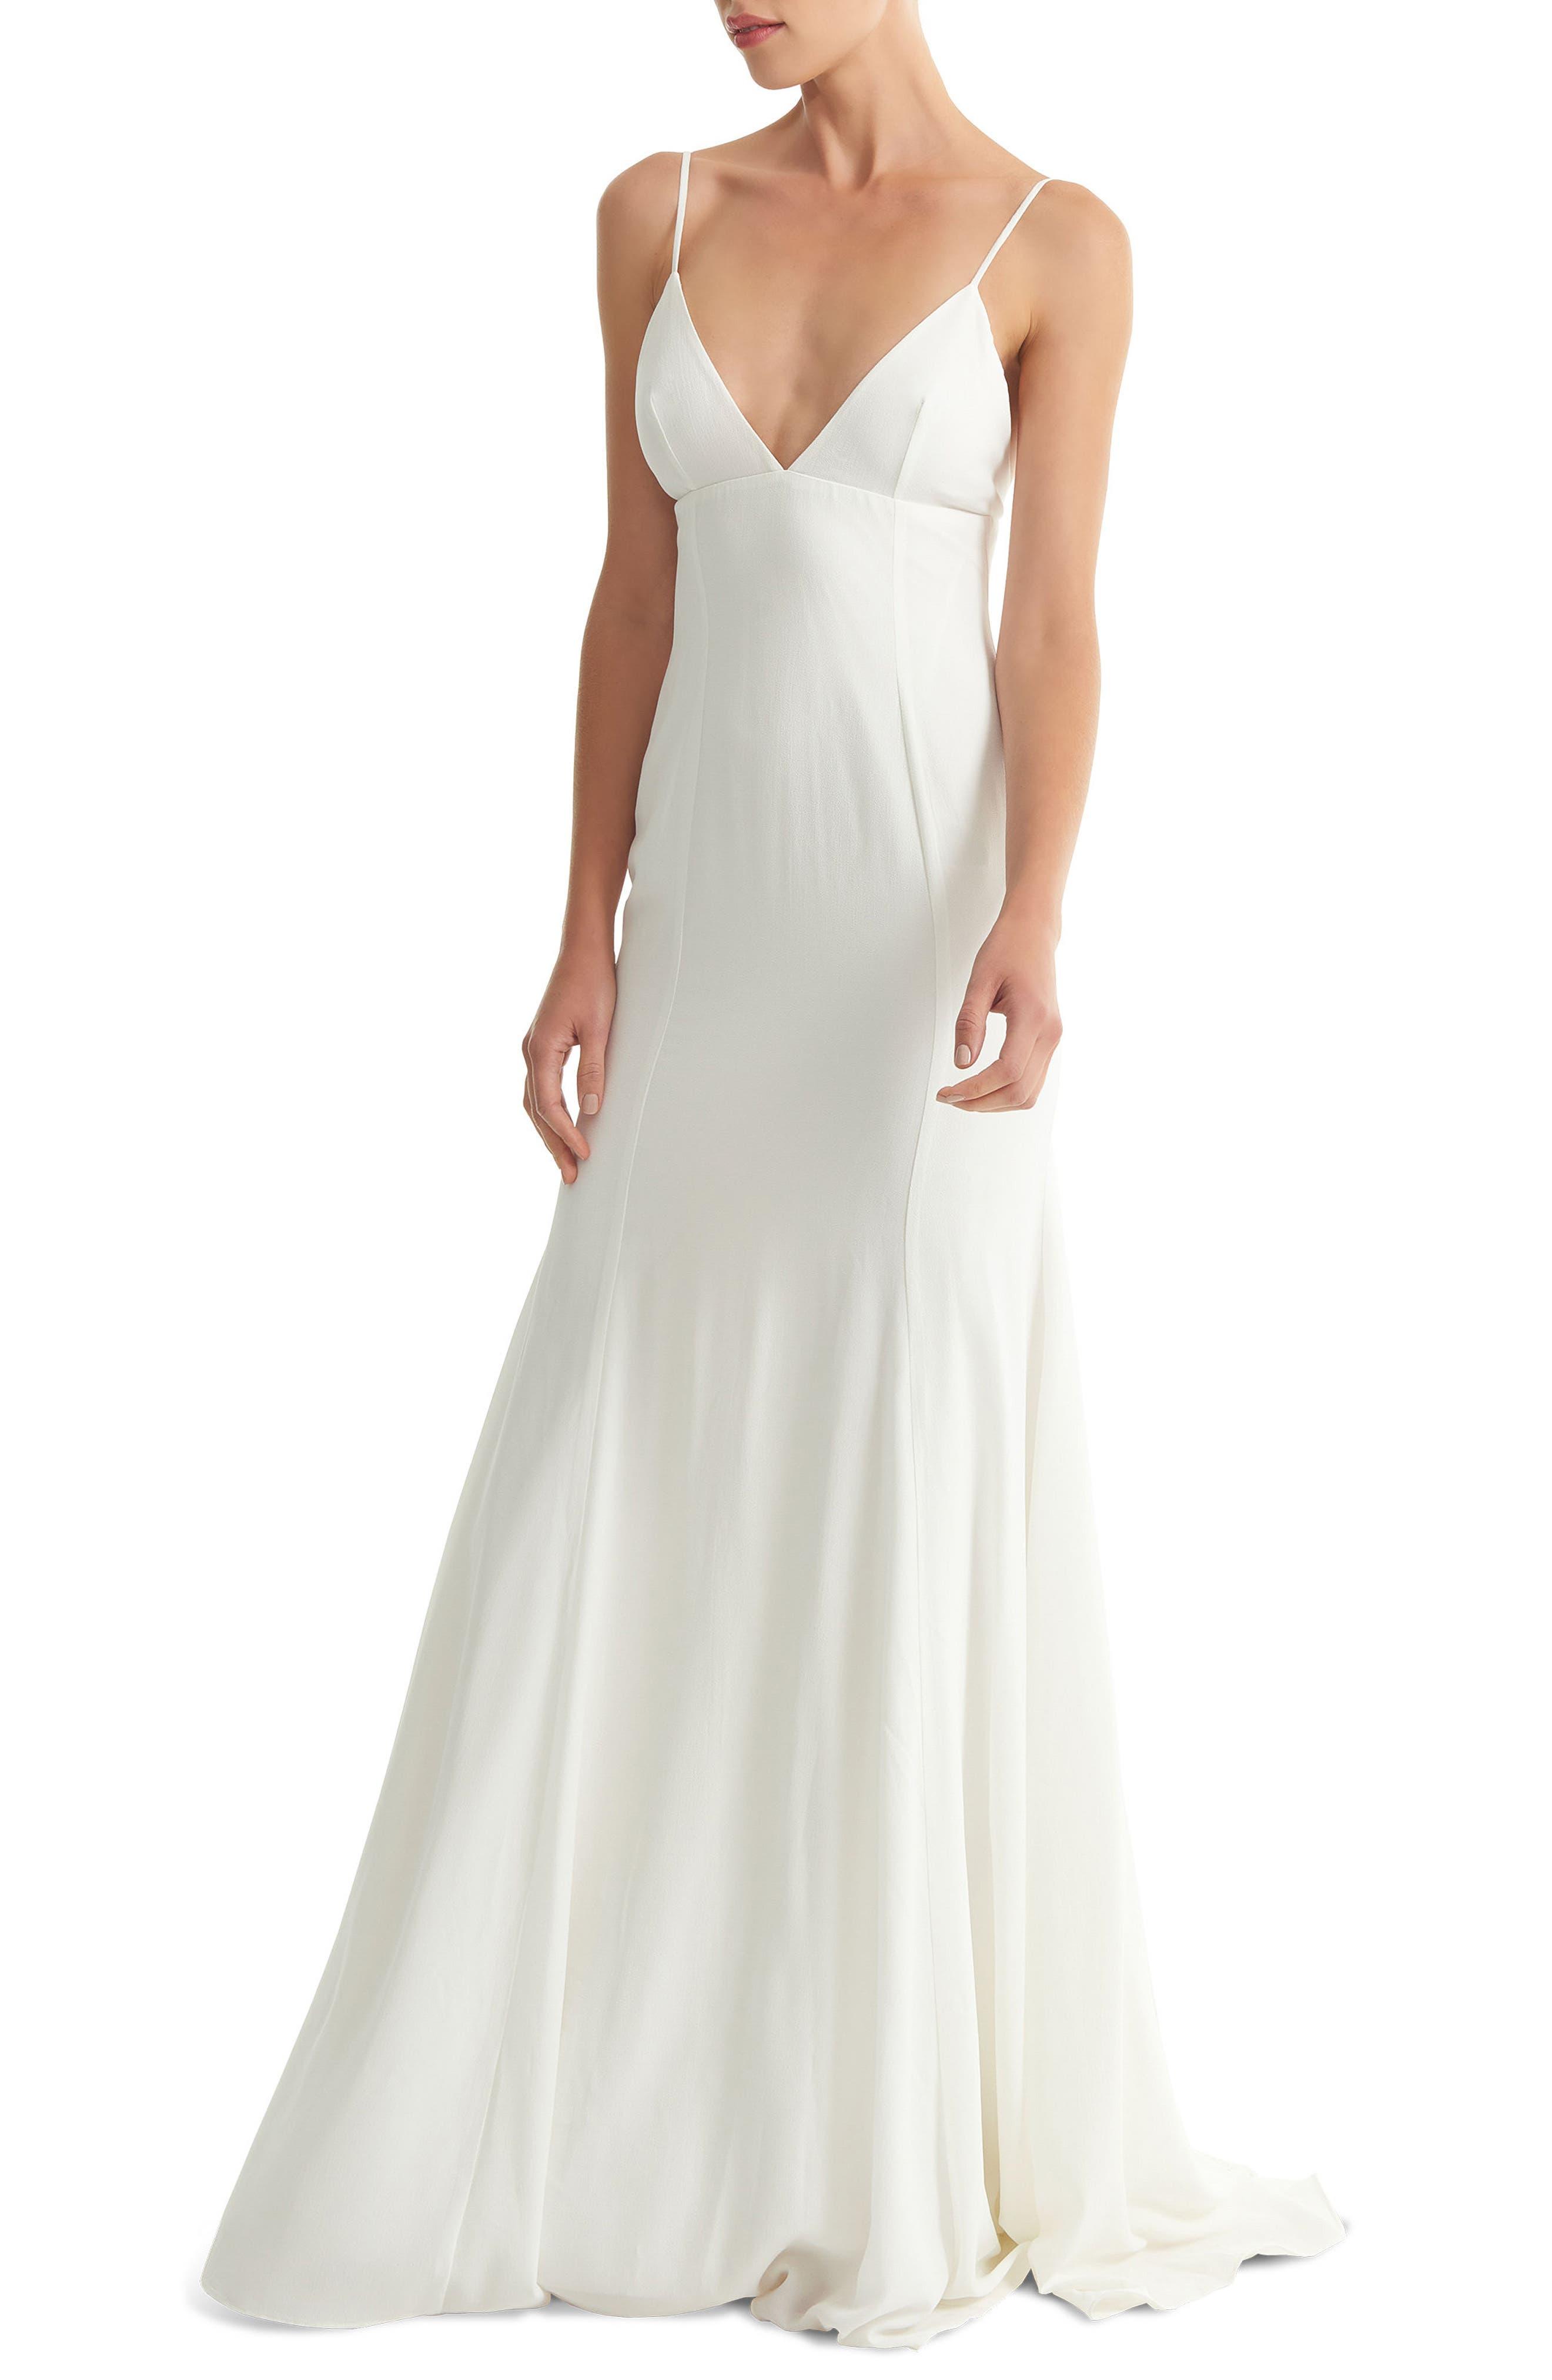 Joanna August Crosby Crepe Mermaid Gown, White (Nordstrom Exclusive)